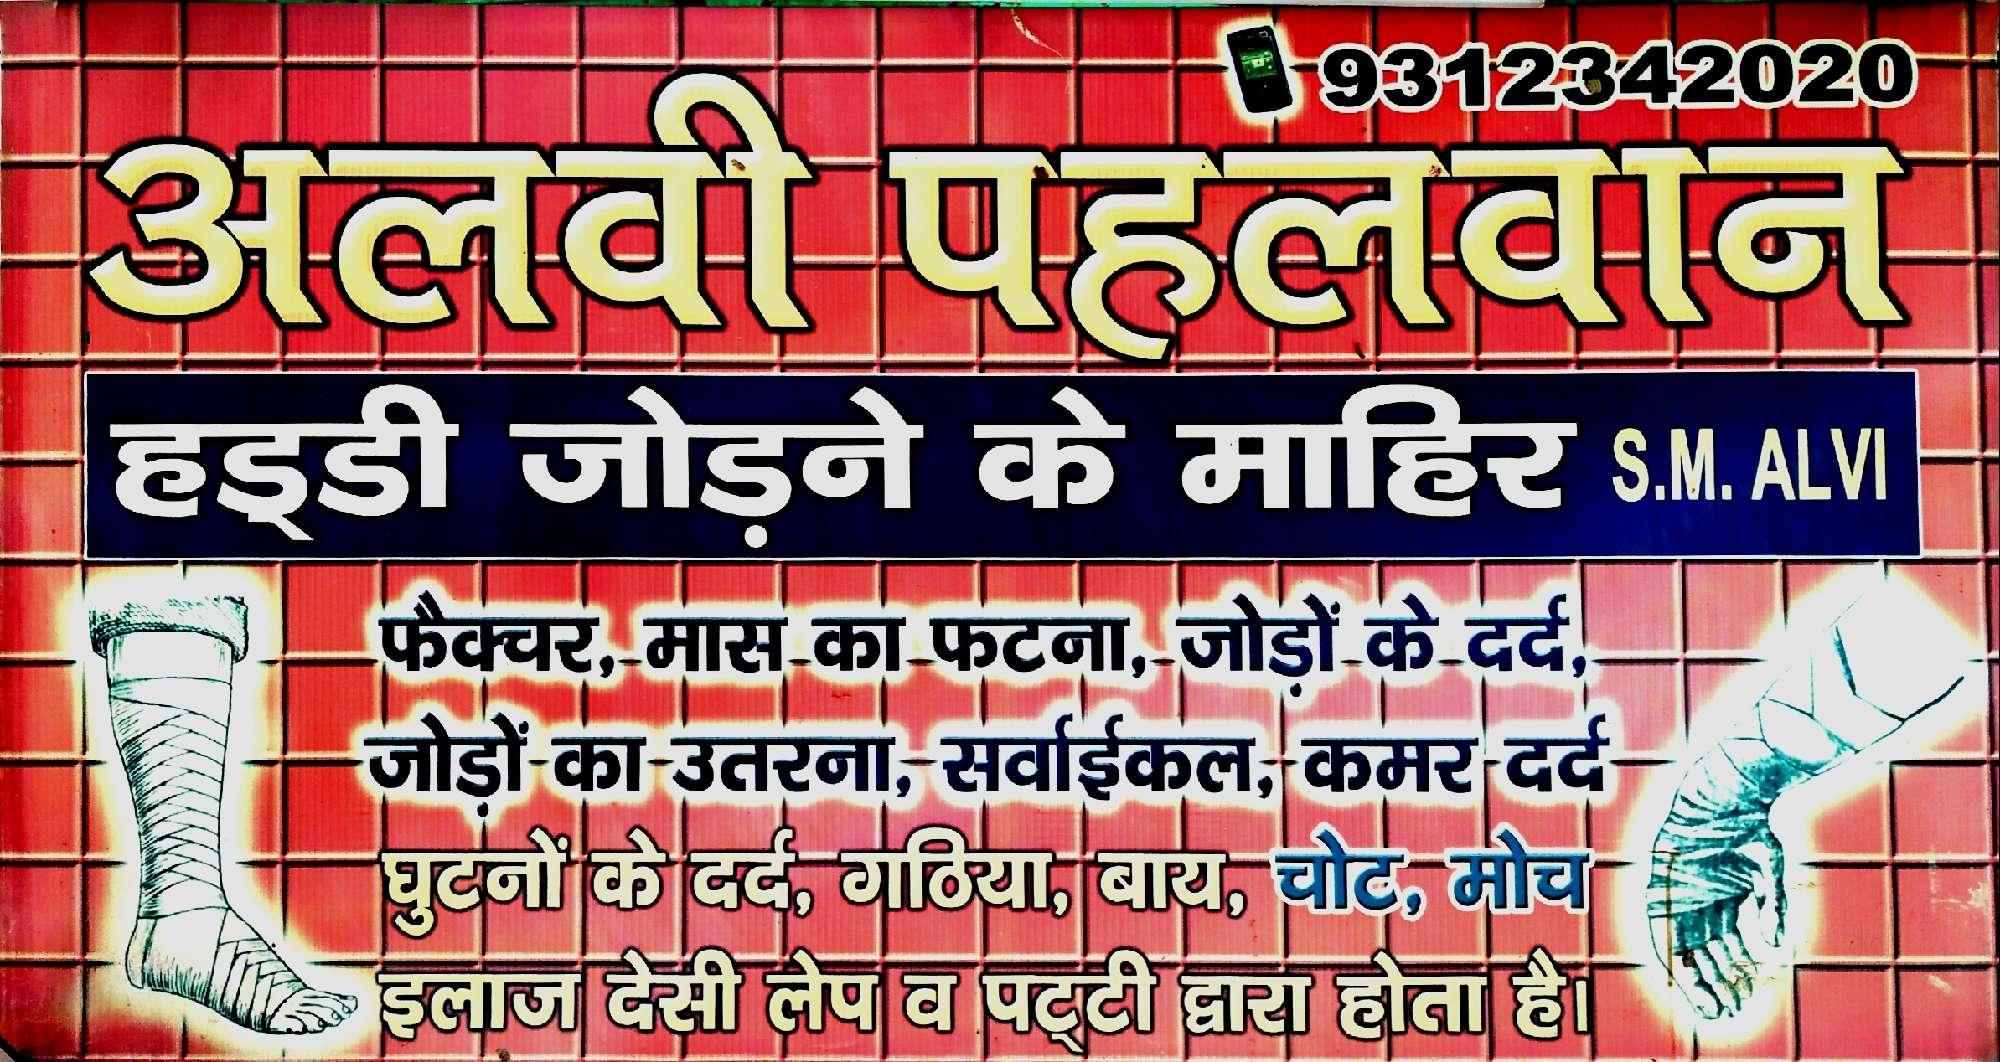 Top 50 Knee Pain Treatment in Delhi - Justdial